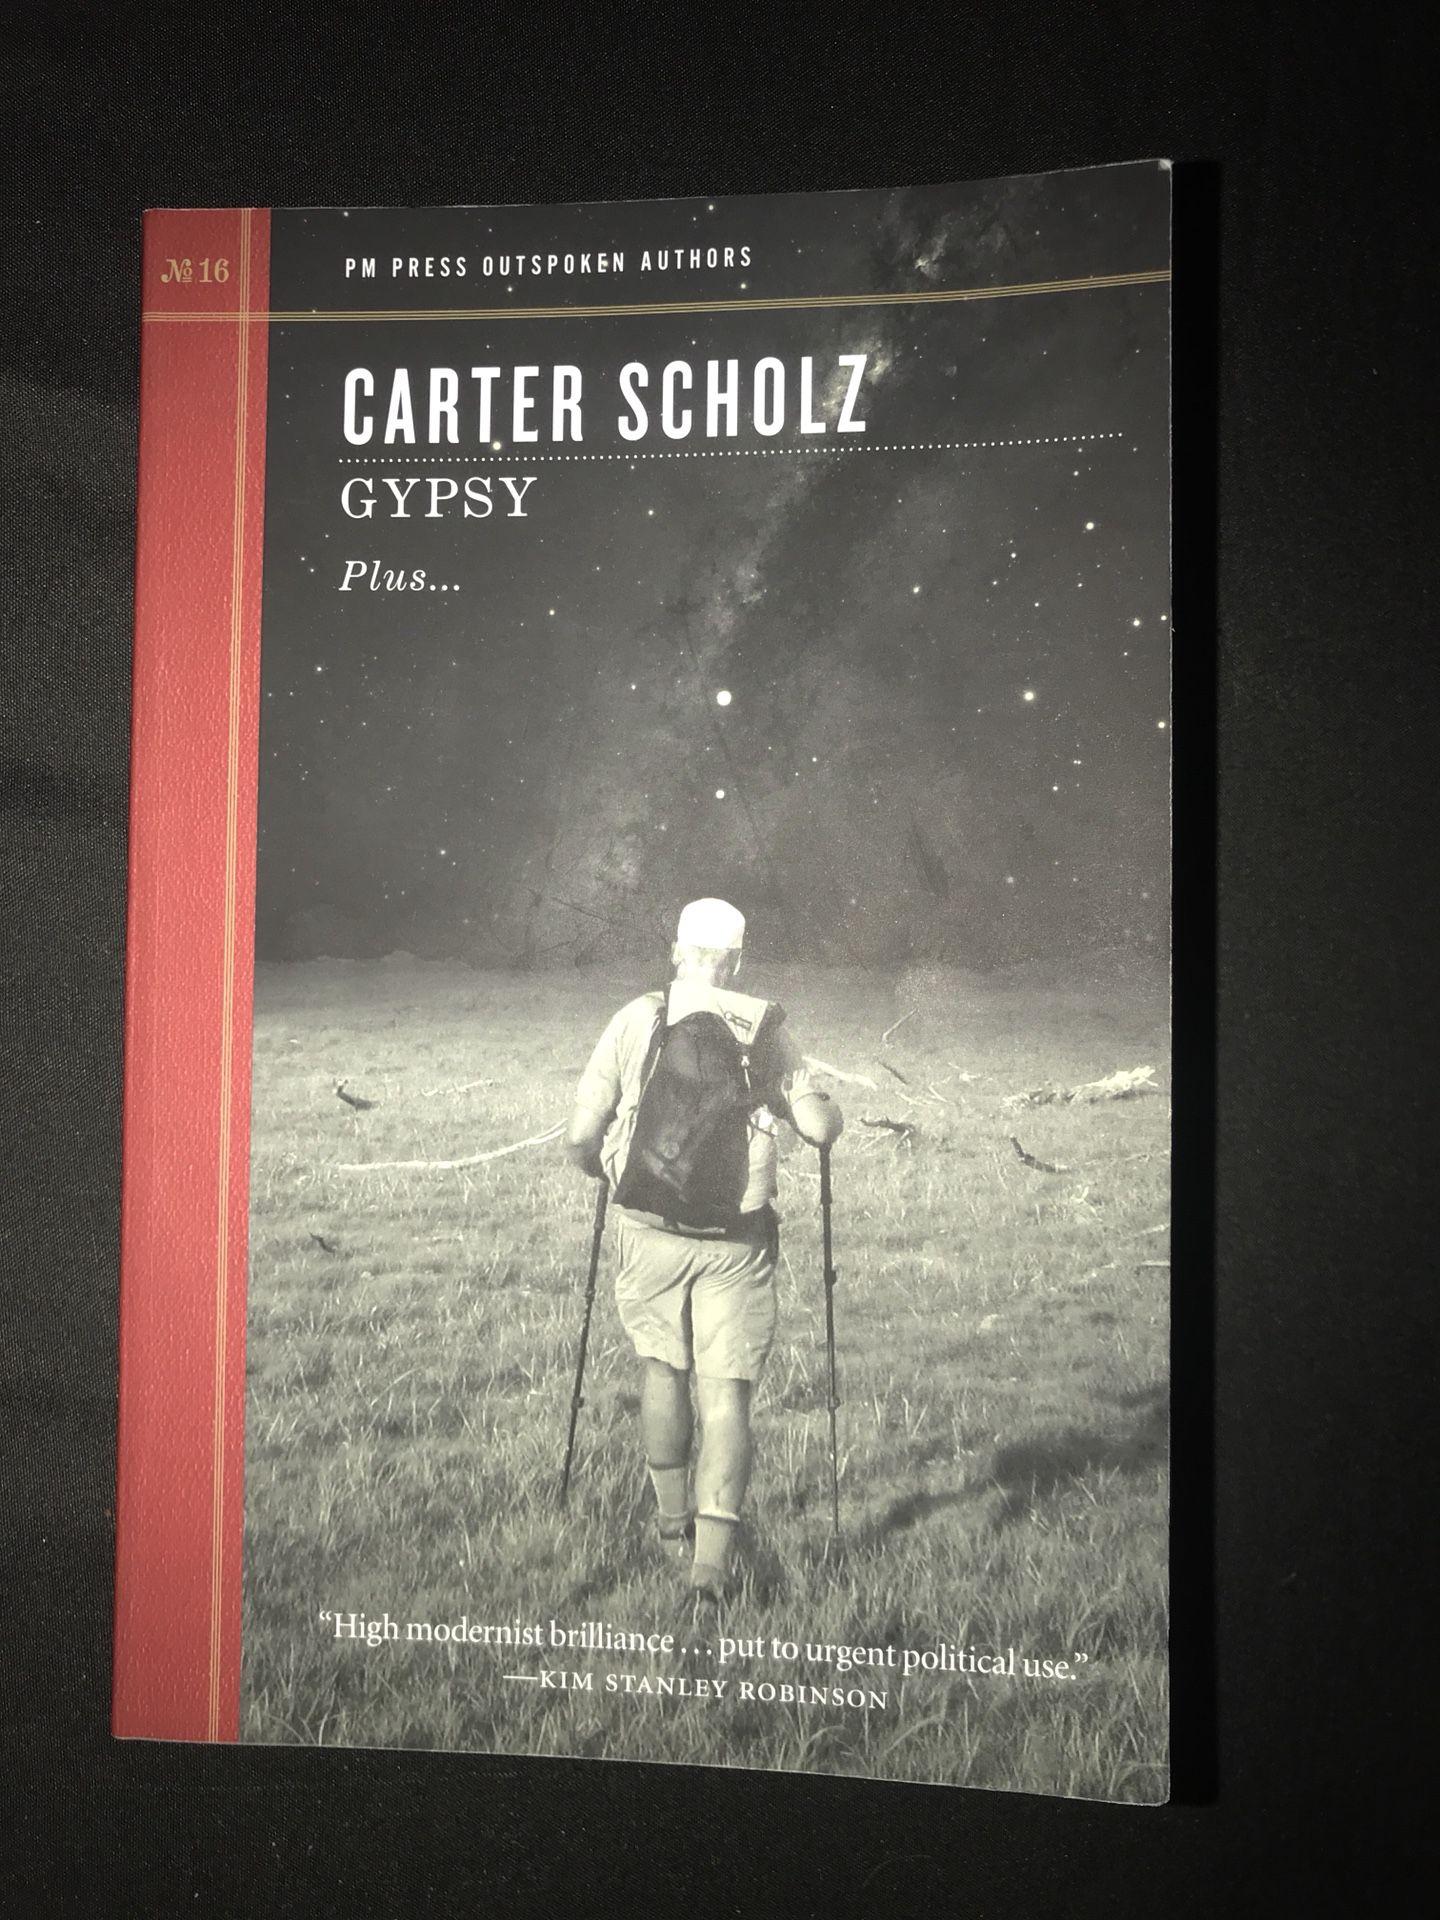 Gypsy by Carter Scholz